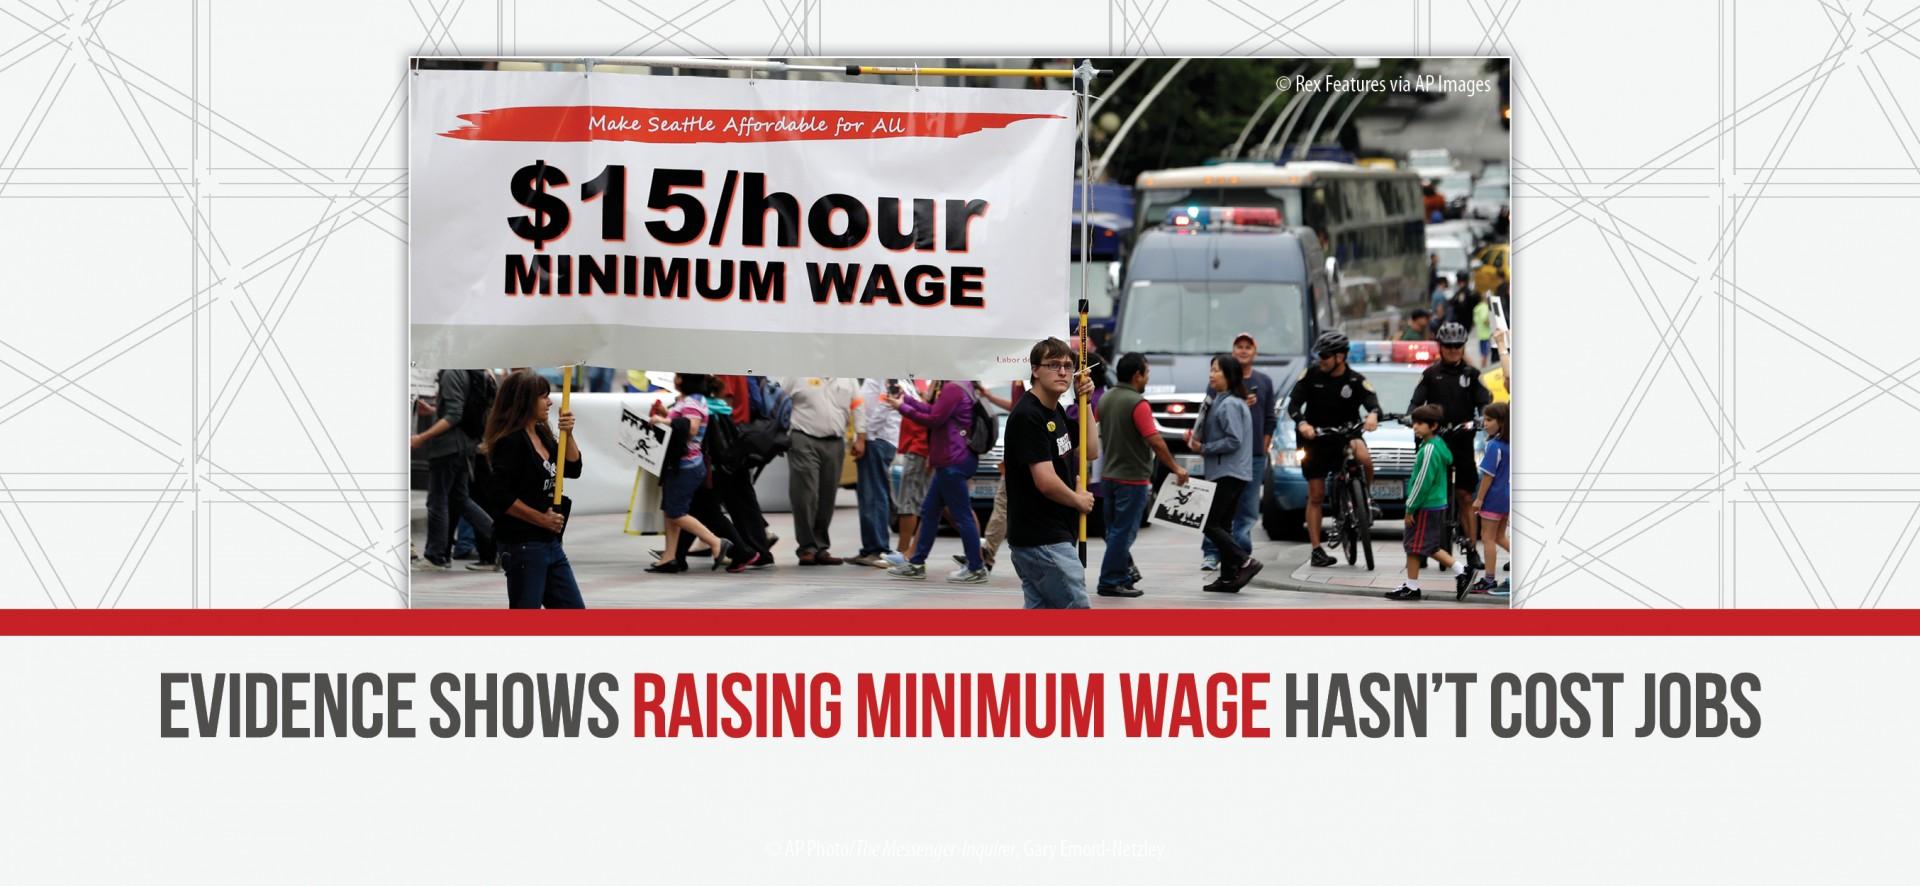 005 Essay On Minimum Wage Example 2014 Mar Apr Images5 Beautiful Free Argumentative Increase 1920